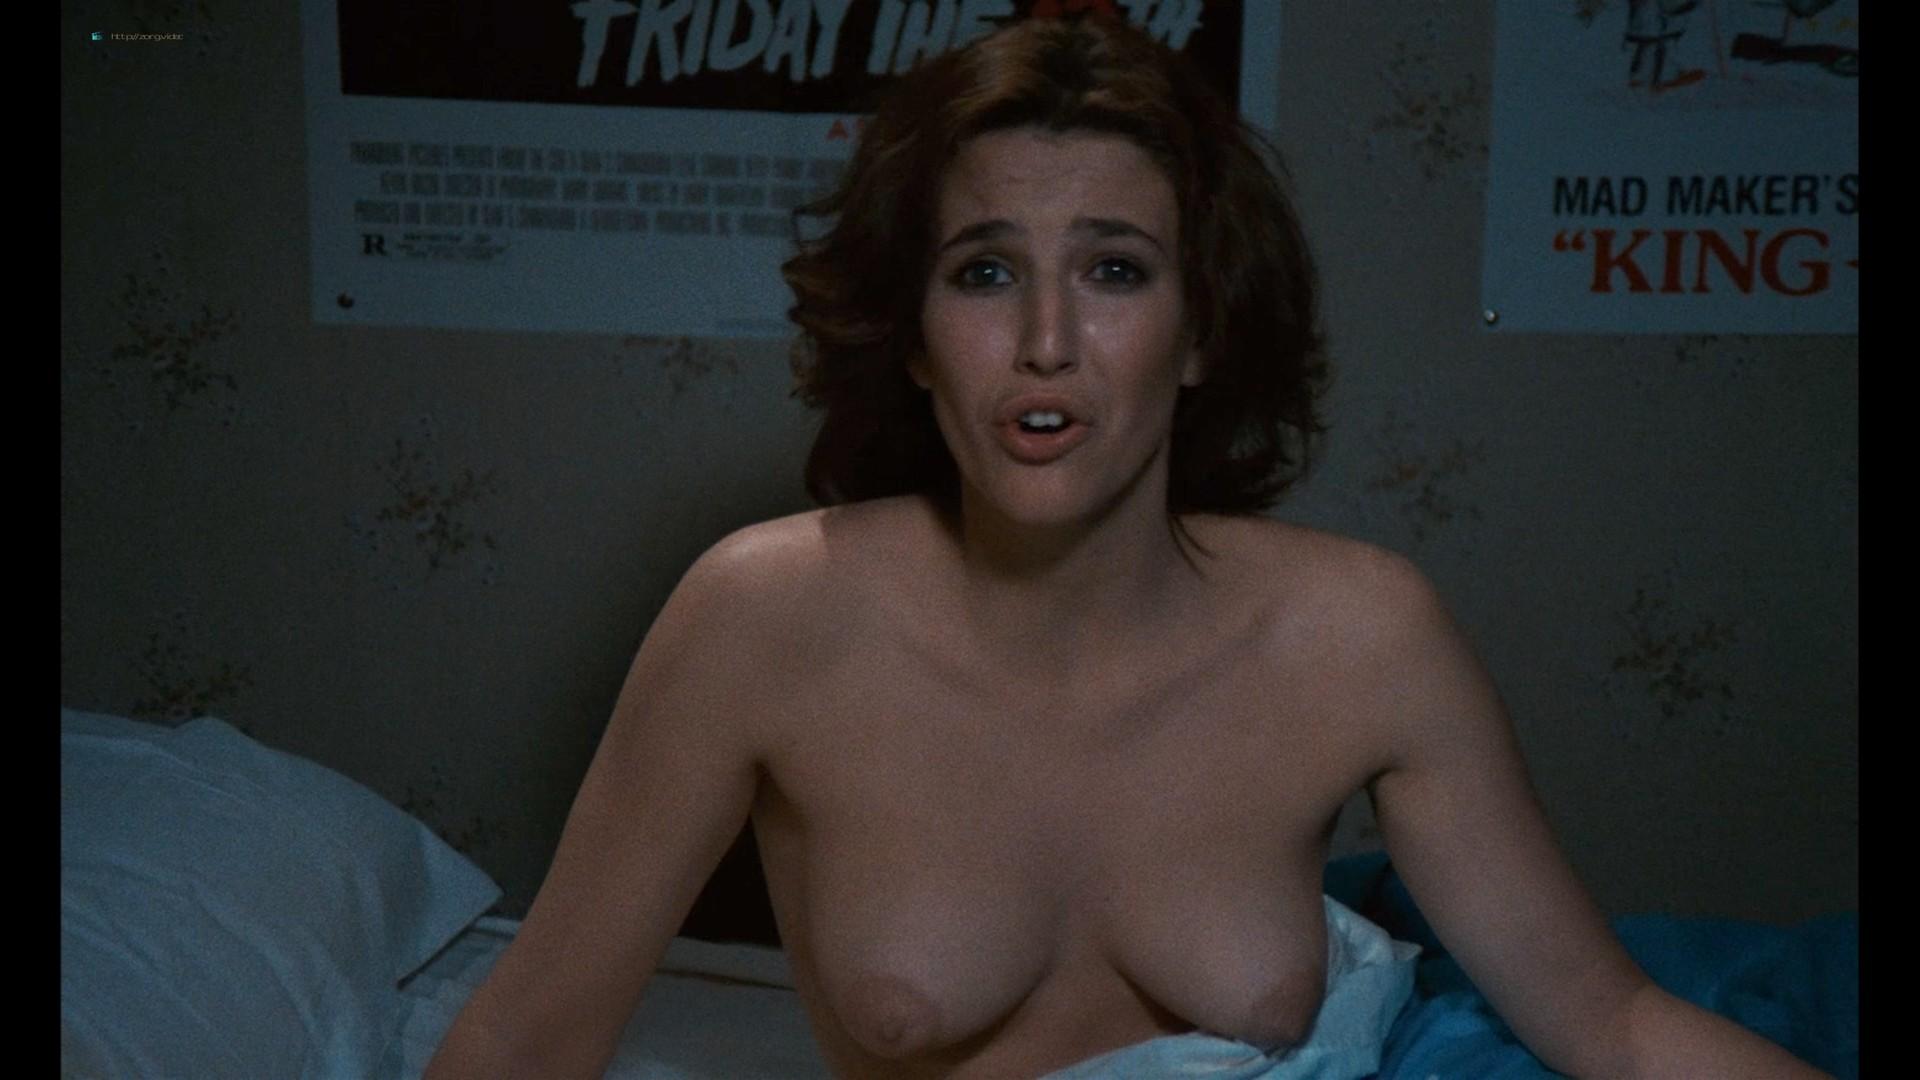 Roxana Nieto nude Leticia Marfil and Pilar Alcón all nude bush topless - Pieces (1982) HD 1080p BluRay (10)